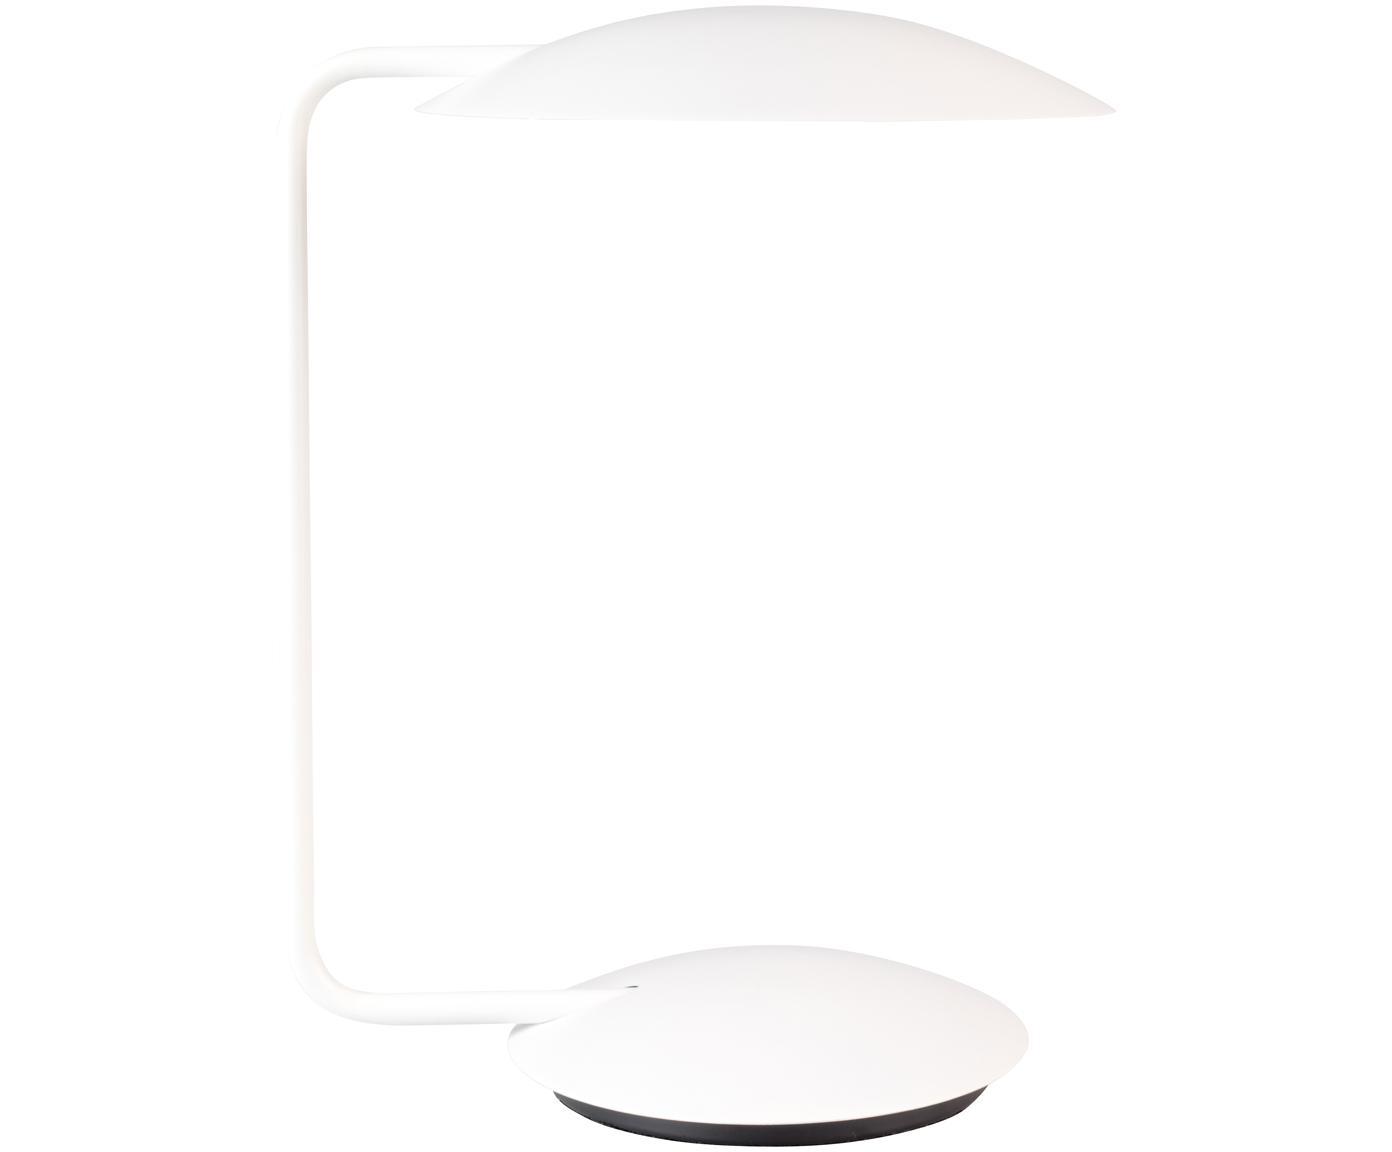 Lámpara de mesa regulable Pixie, Cable: cubierto en tela, Blanco, An 25 x Al 39 cm